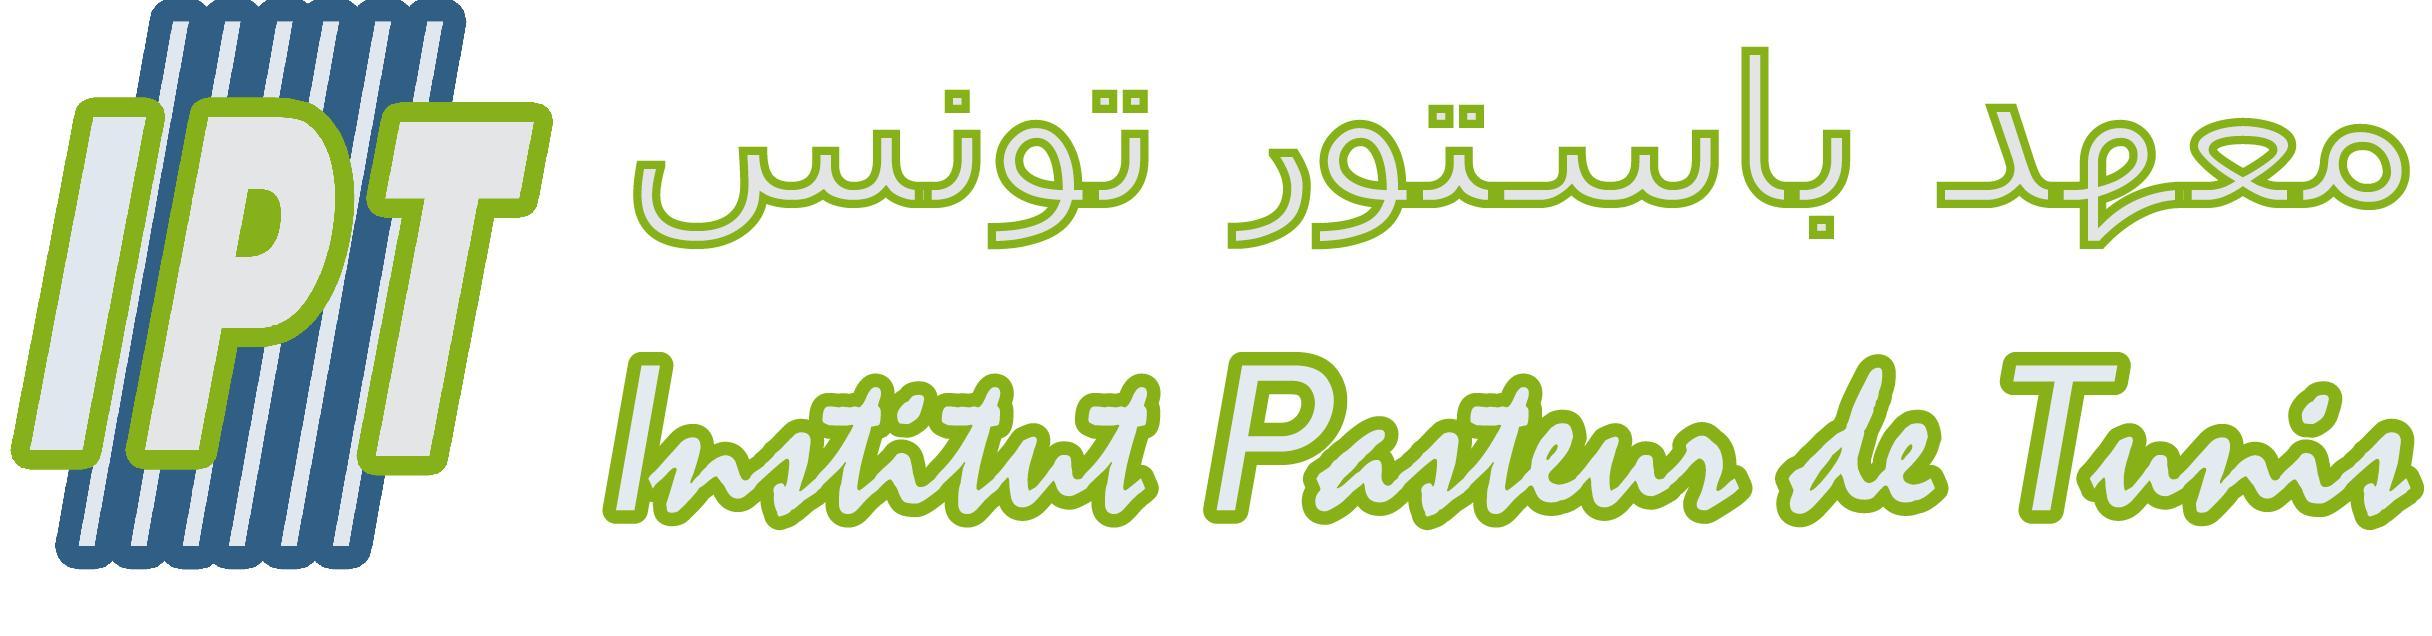 logo_IP_Tunis_fr_ar_1.jpg